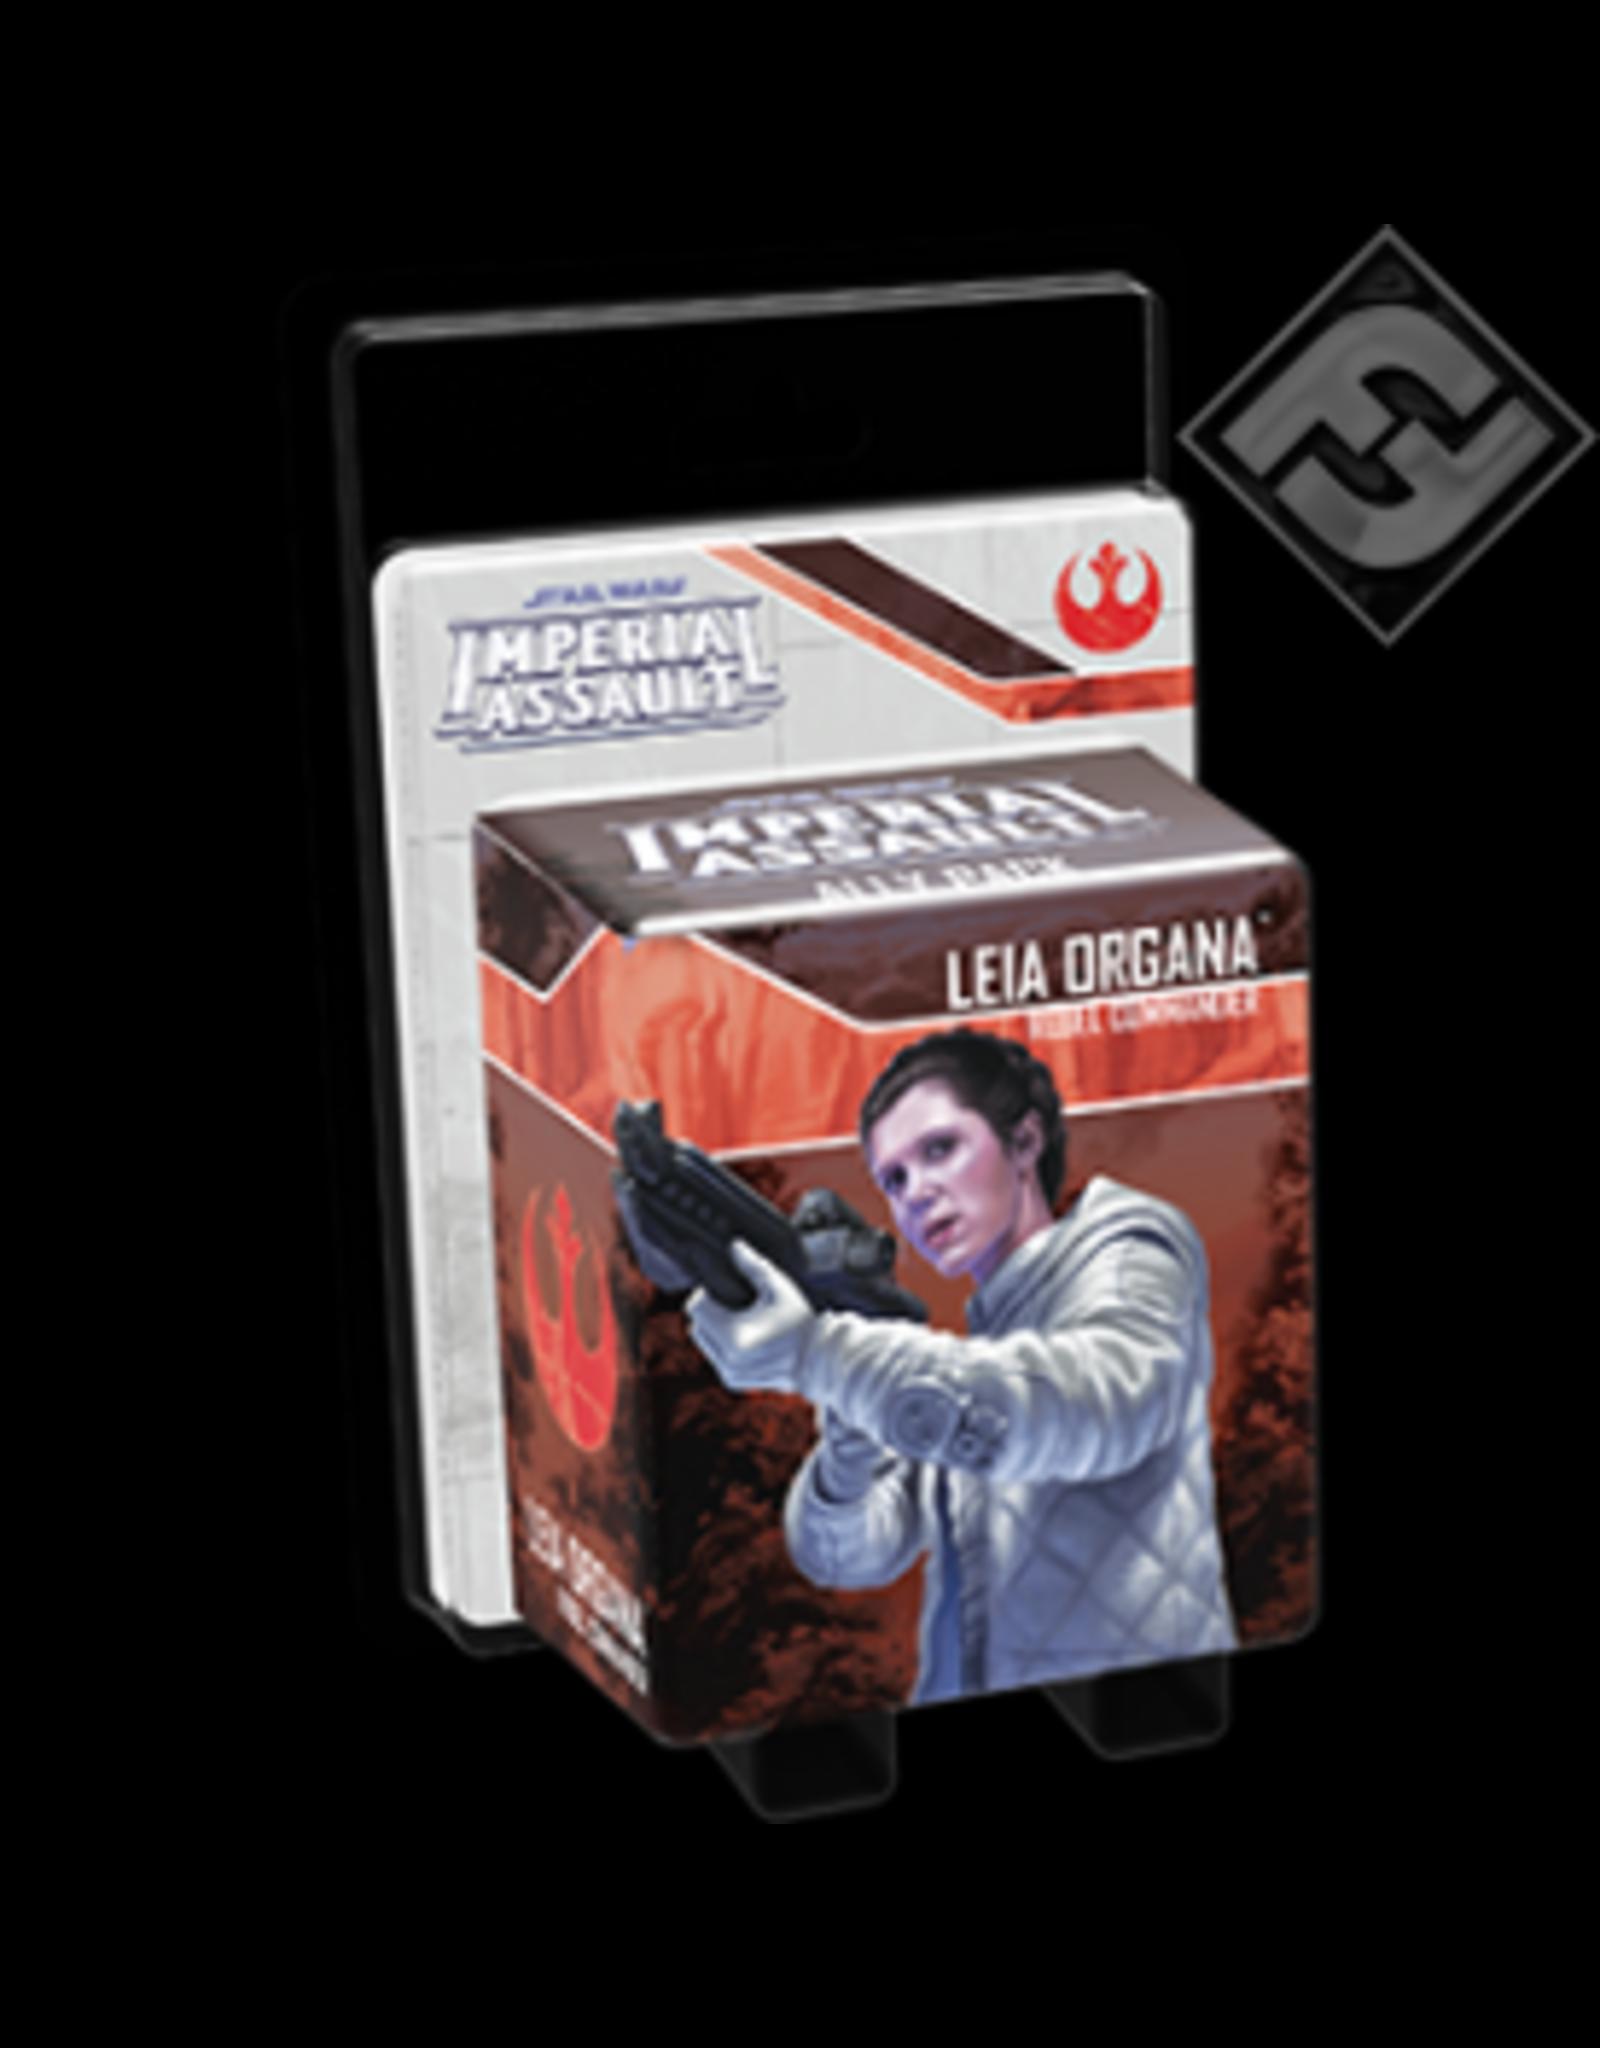 Star Wars Imperial Assault Star Wars Imperial Assault Leia Organa